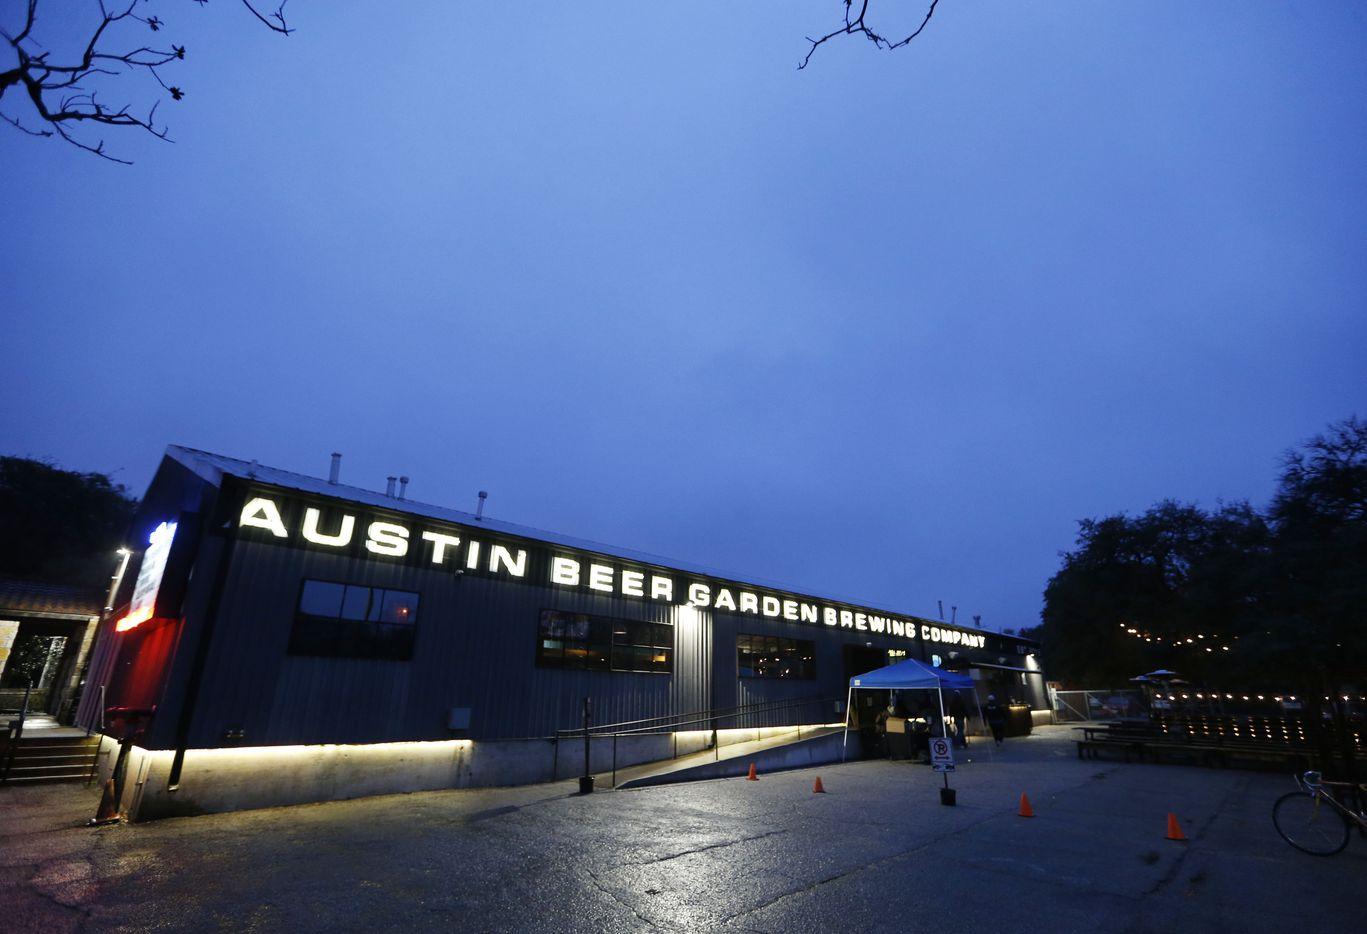 Austin Beer Garden Brewing Company in Austin